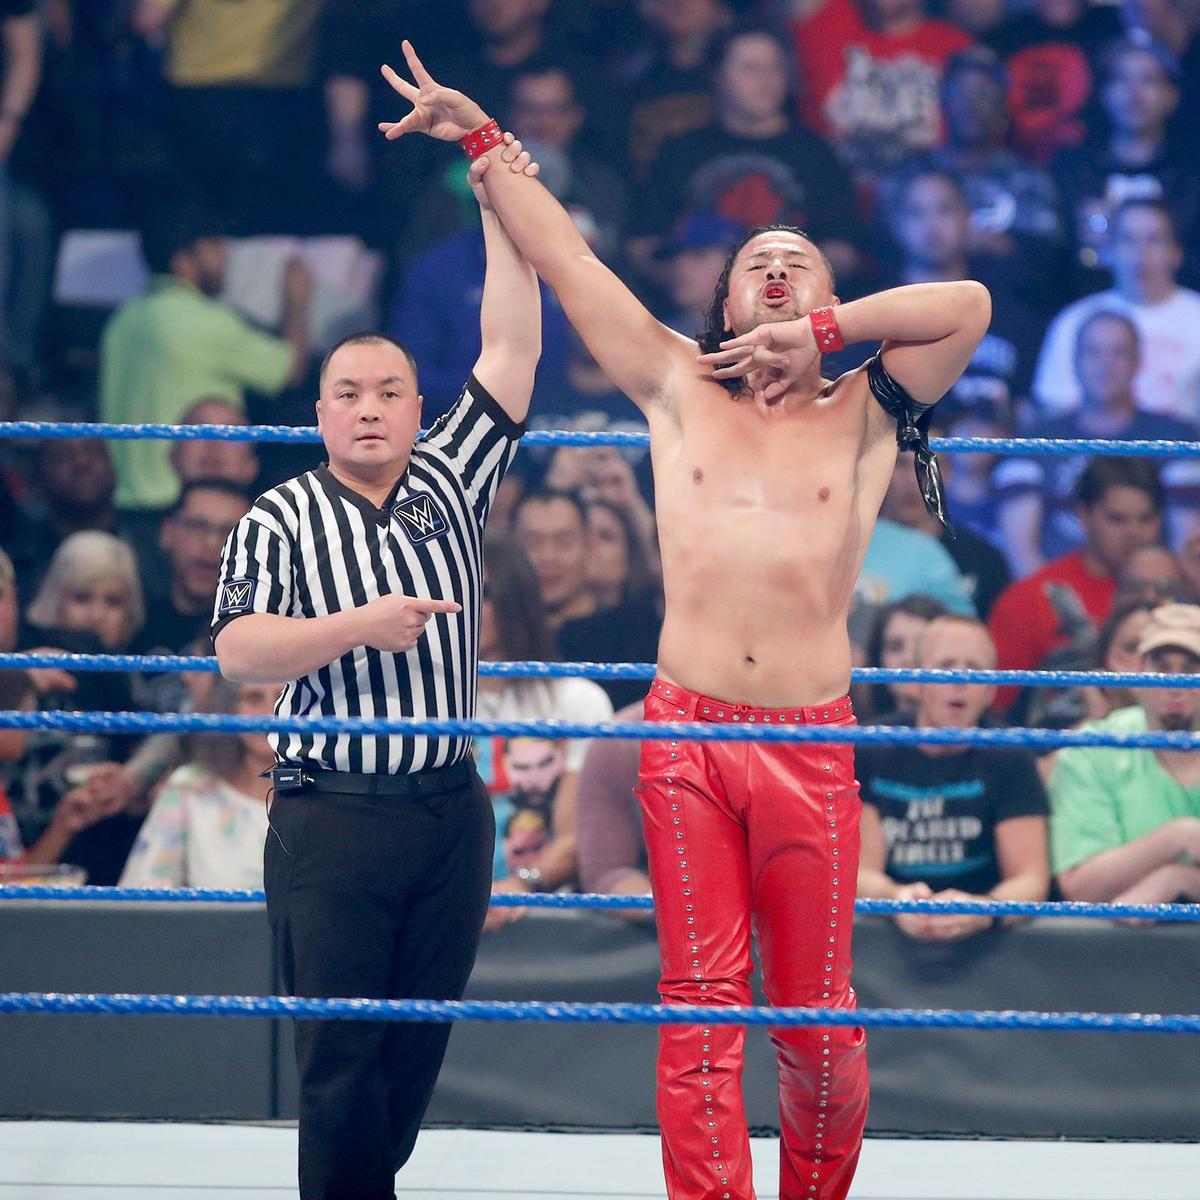 Shinsuke Nakamaura picks up an impressive victory in his SmackDown LIVE in-ring debut.